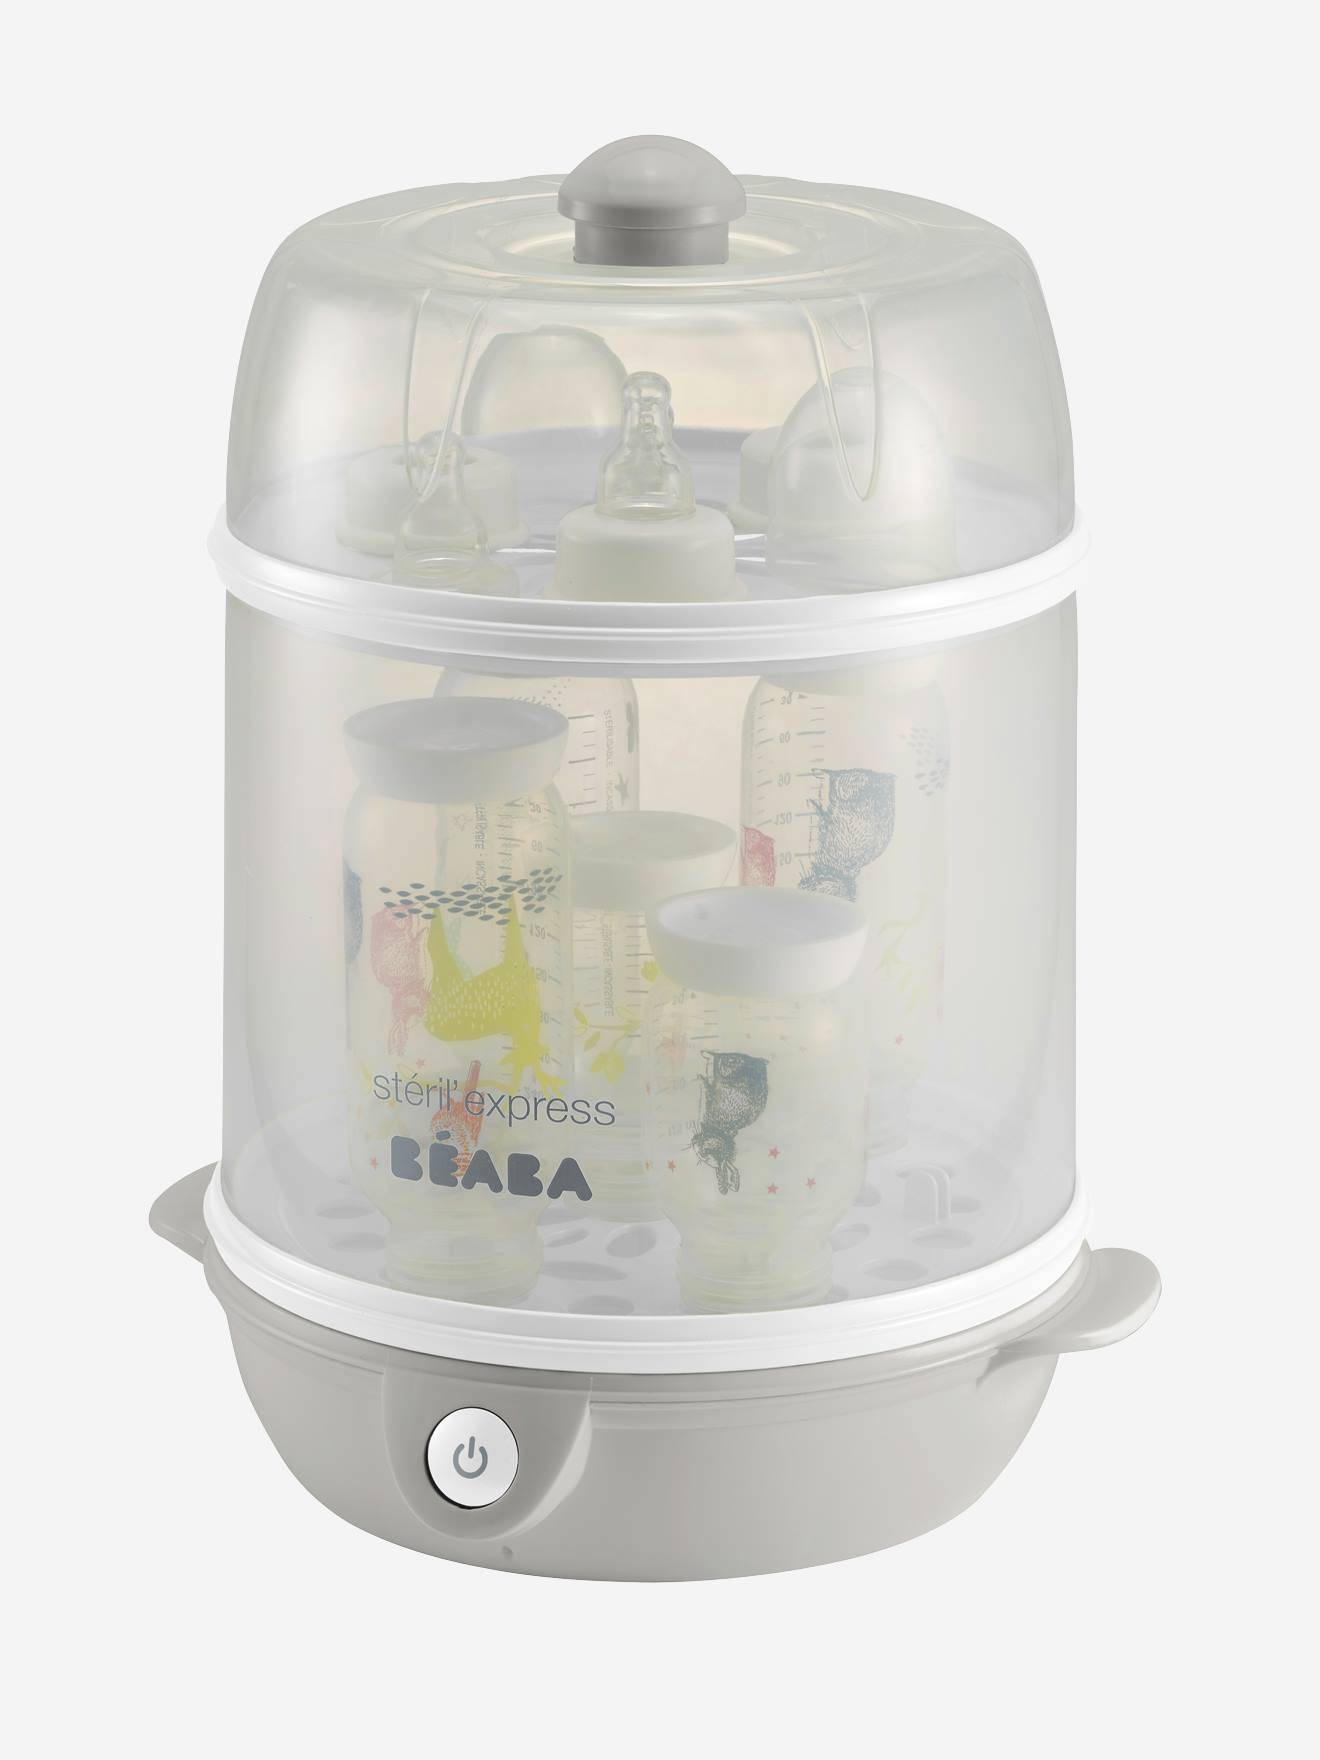 beaba stérilisateur stéril express evolutif beaba gris/blanc